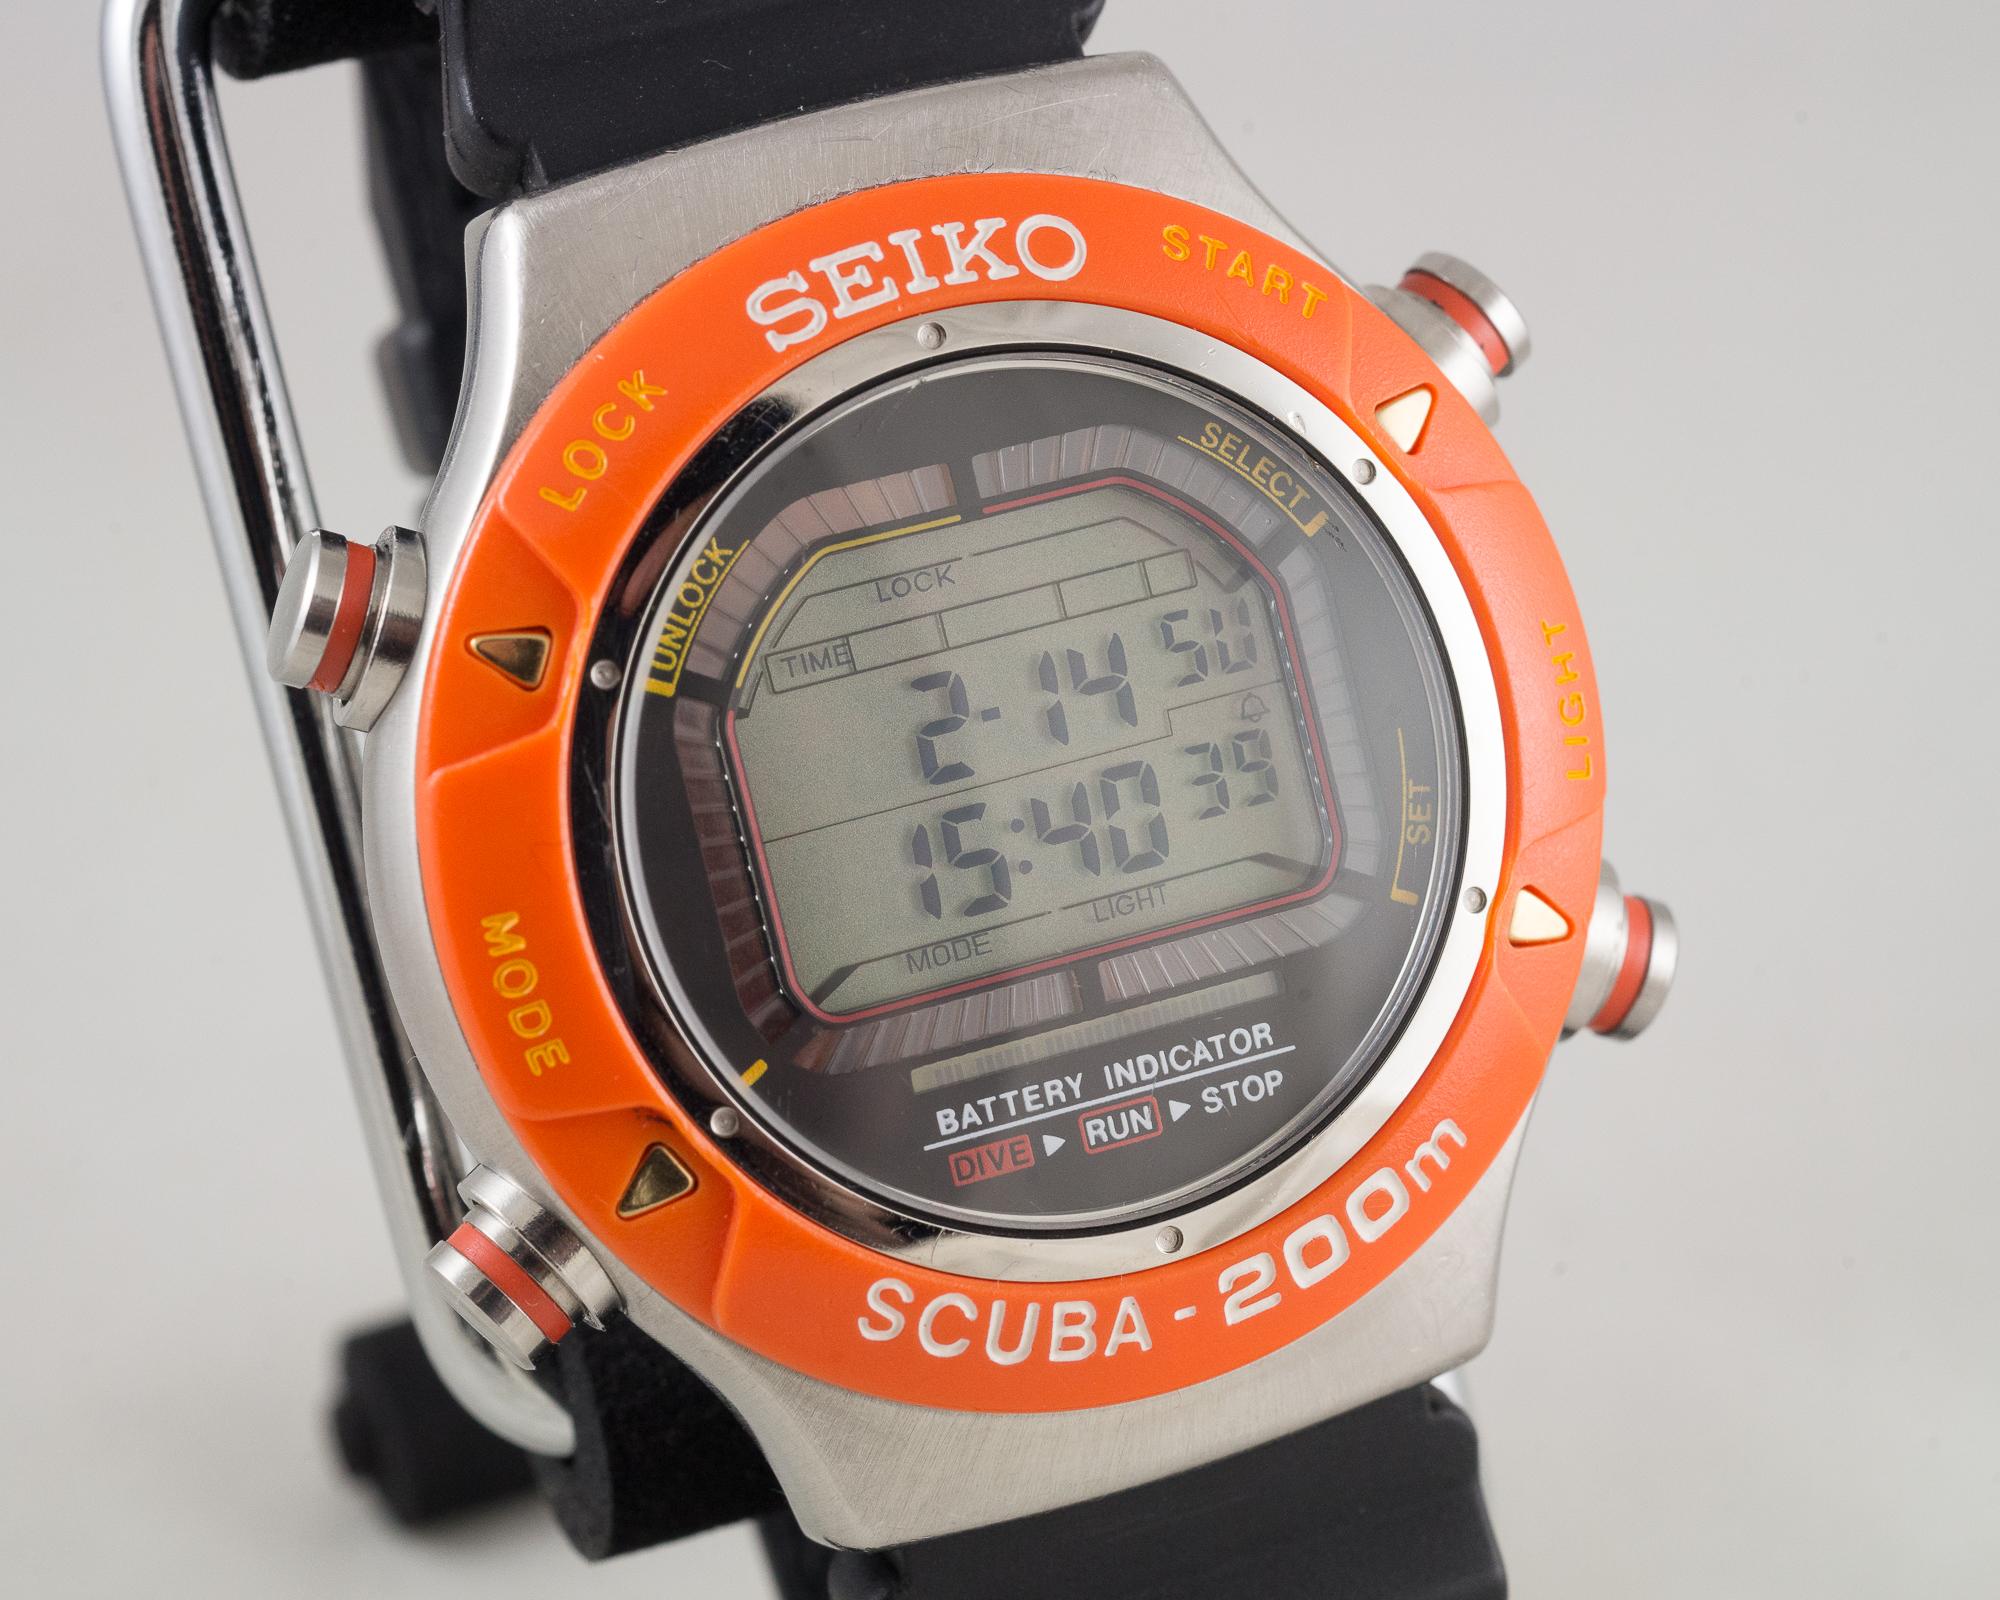 Seiko S800-0010